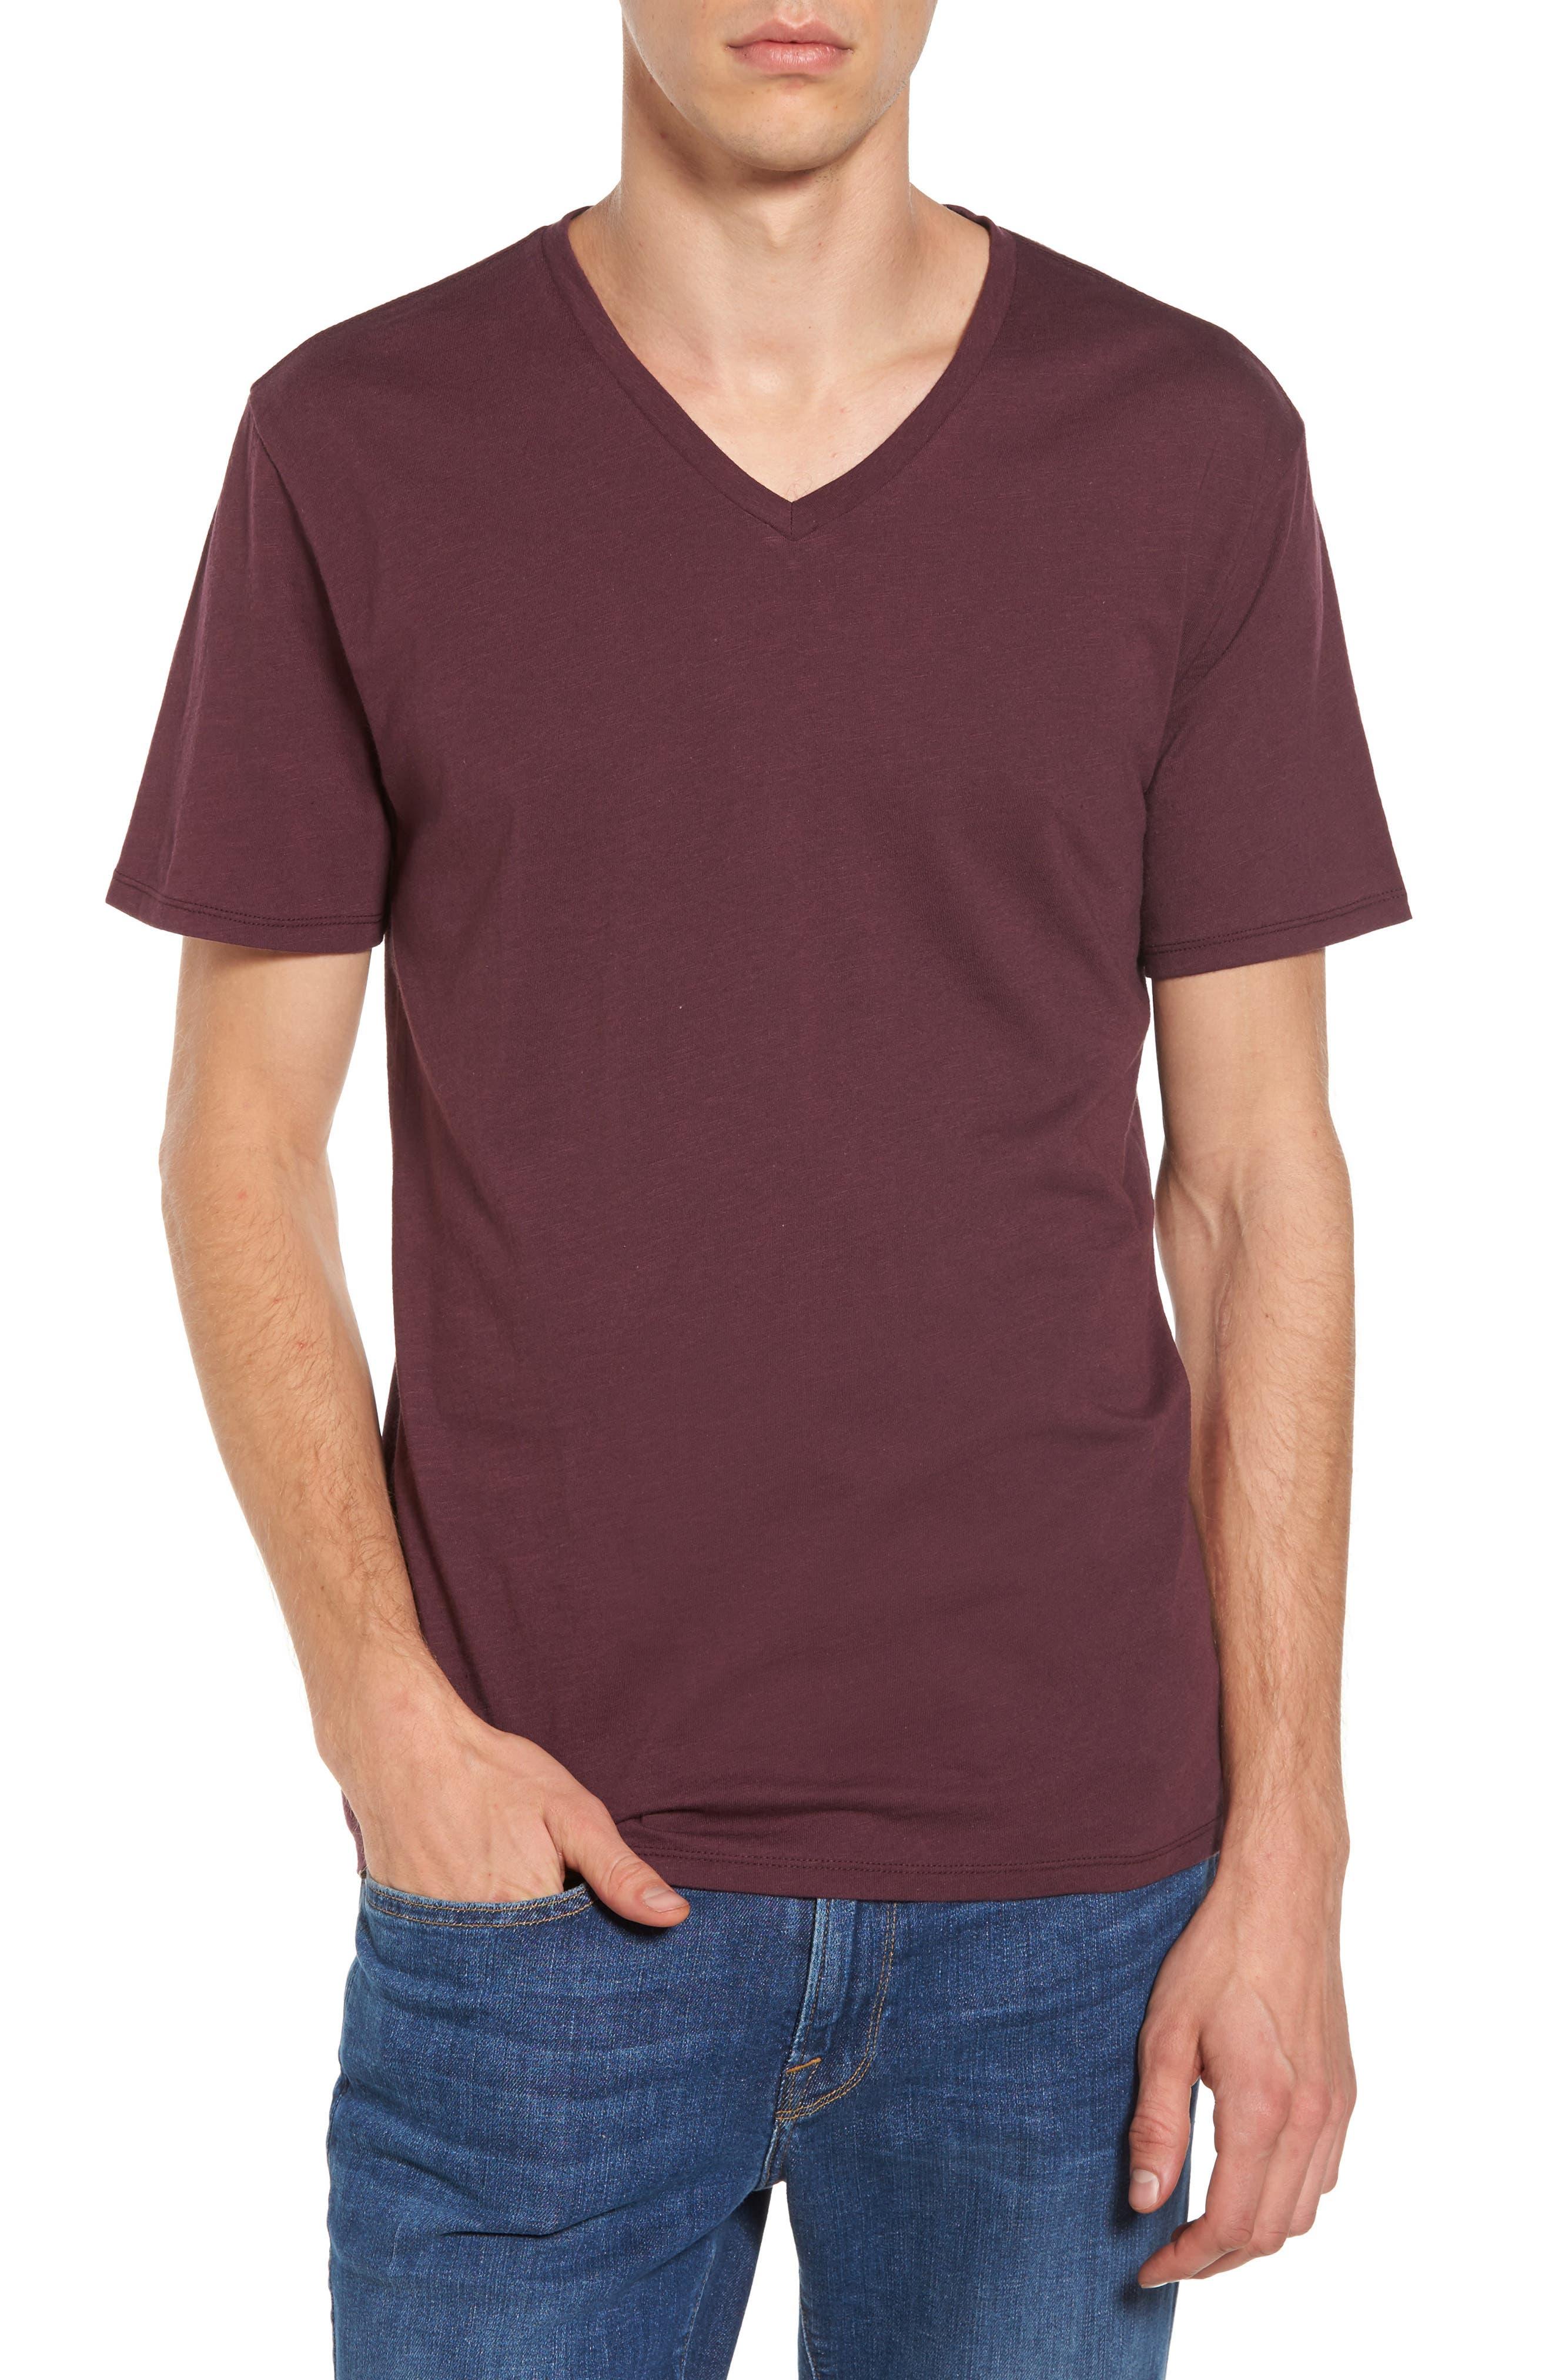 Main Image - The Rail Slub Cotton V-Neck T-Shirt (2 for $30)